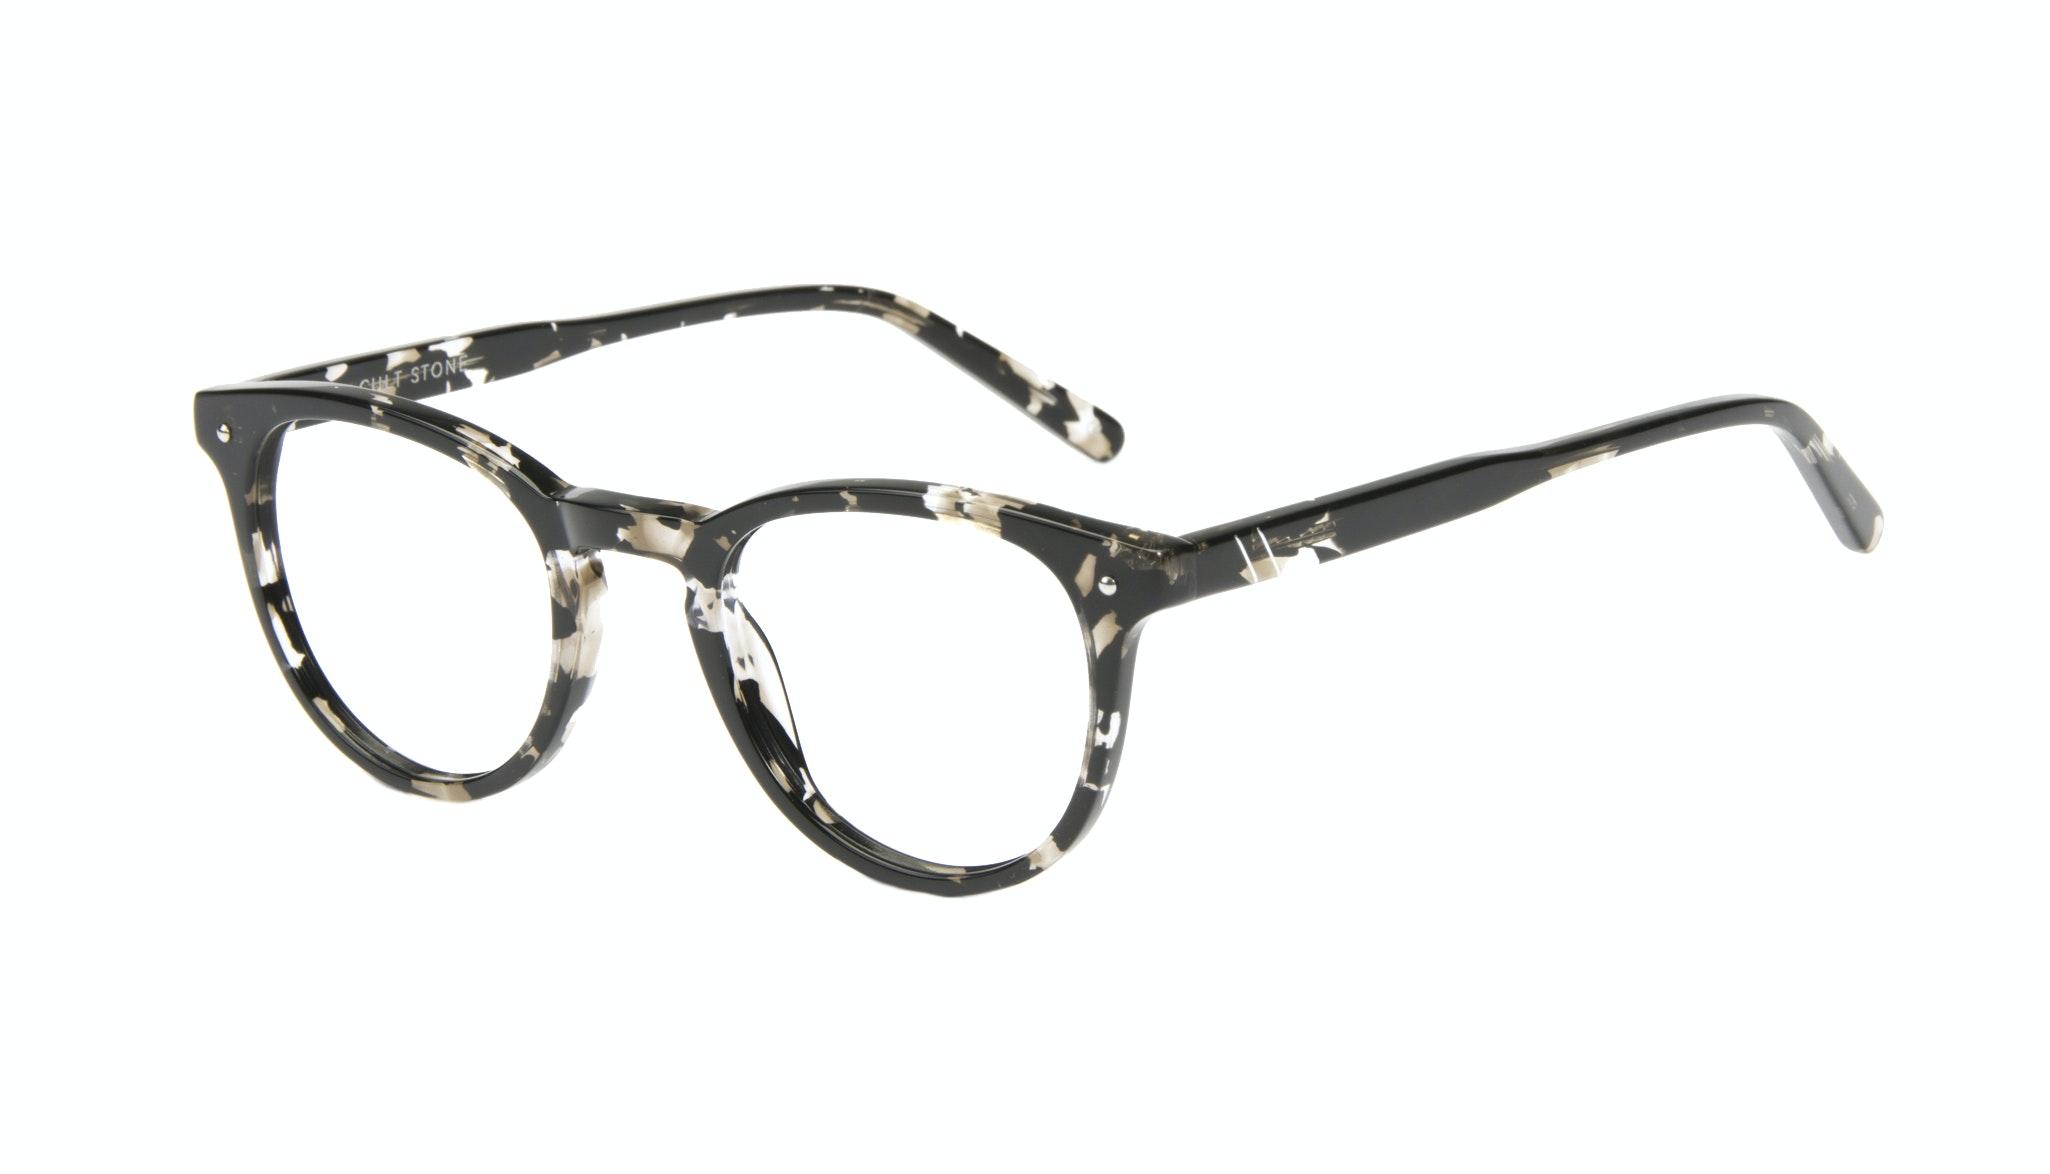 Affordable Fashion Glasses Round Eyeglasses Men Cult Stone Tilt